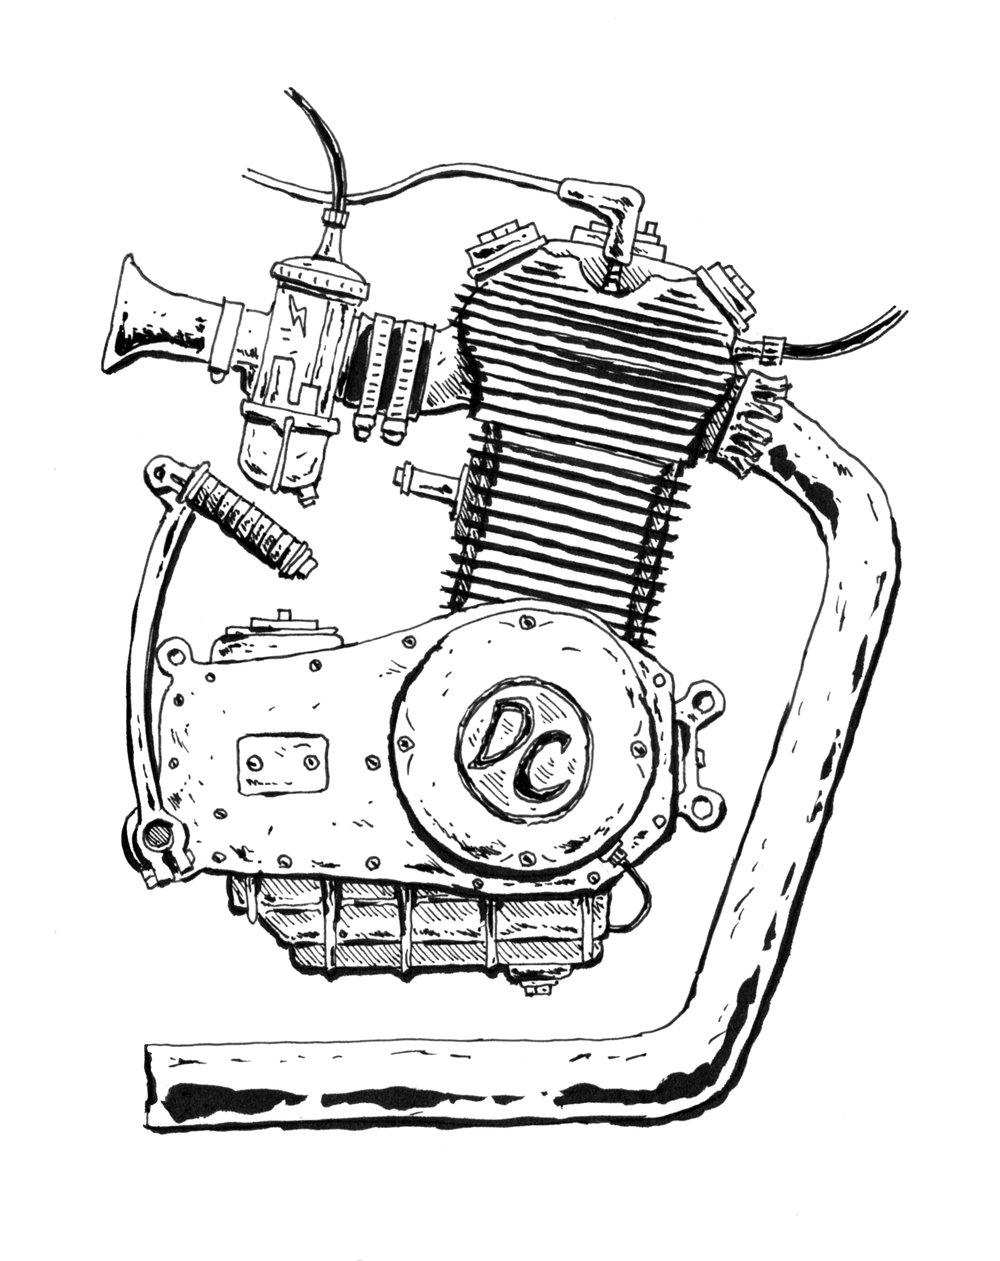 DC_Engine.jpg